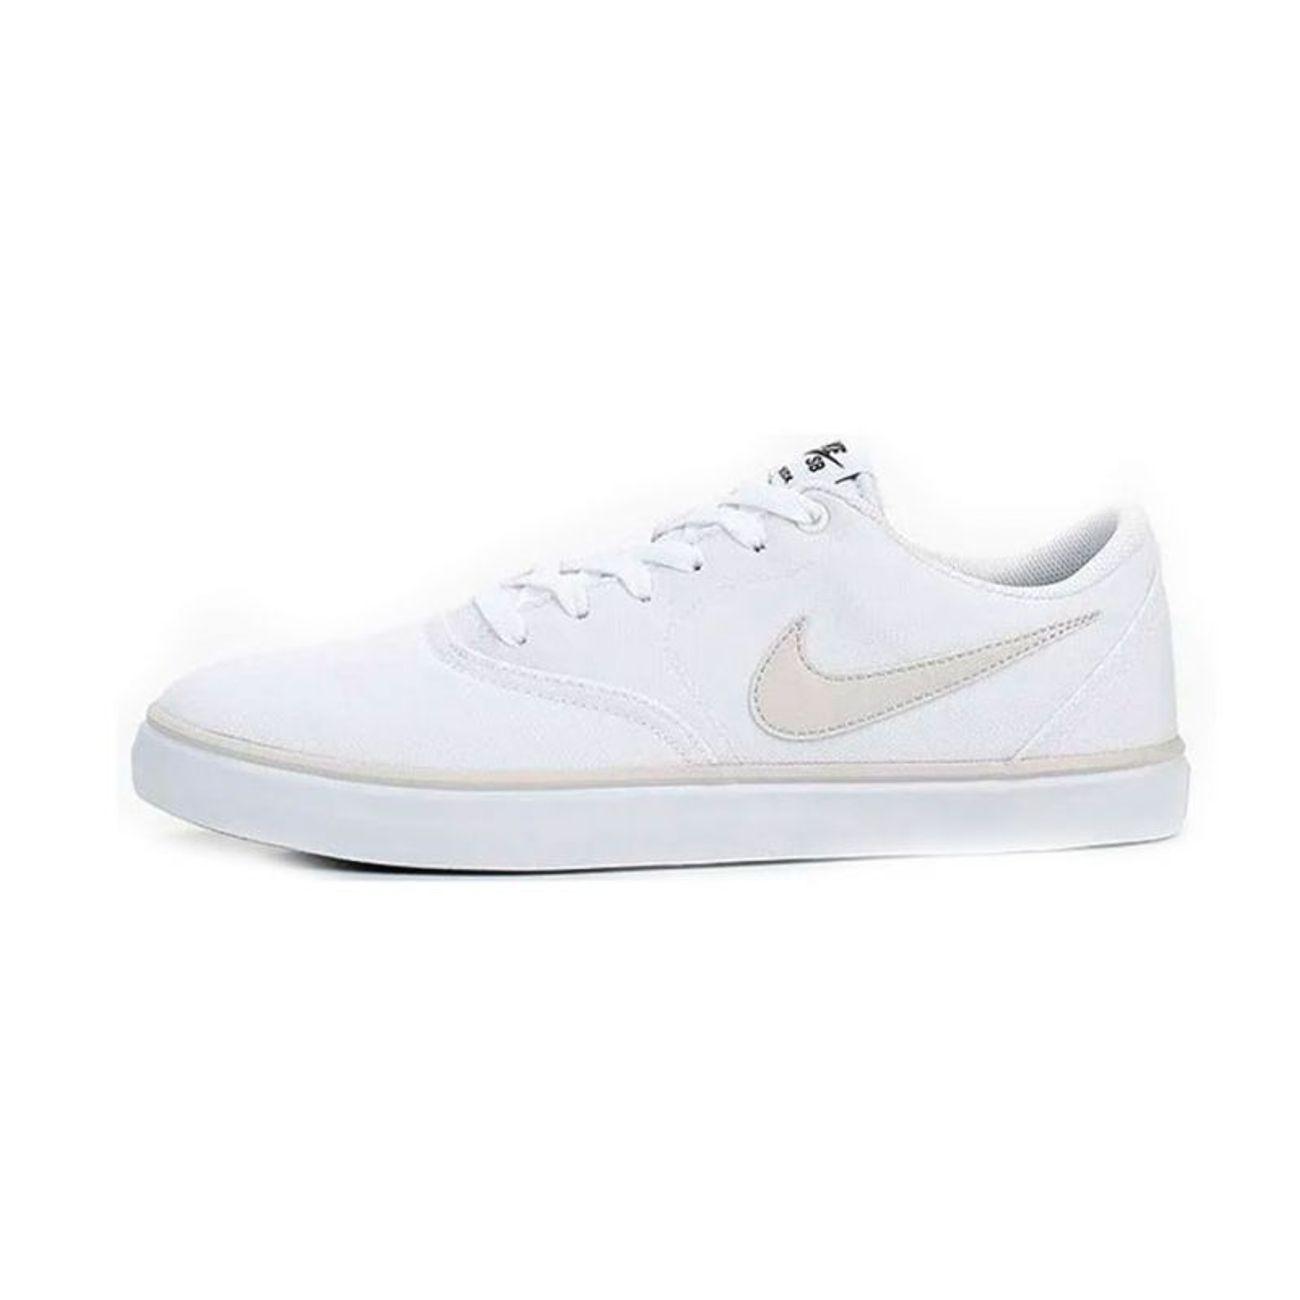 Sb Solar Nike Blanc Ni843896 Padel Check Canvas 101 Adulte 1cFlKJ